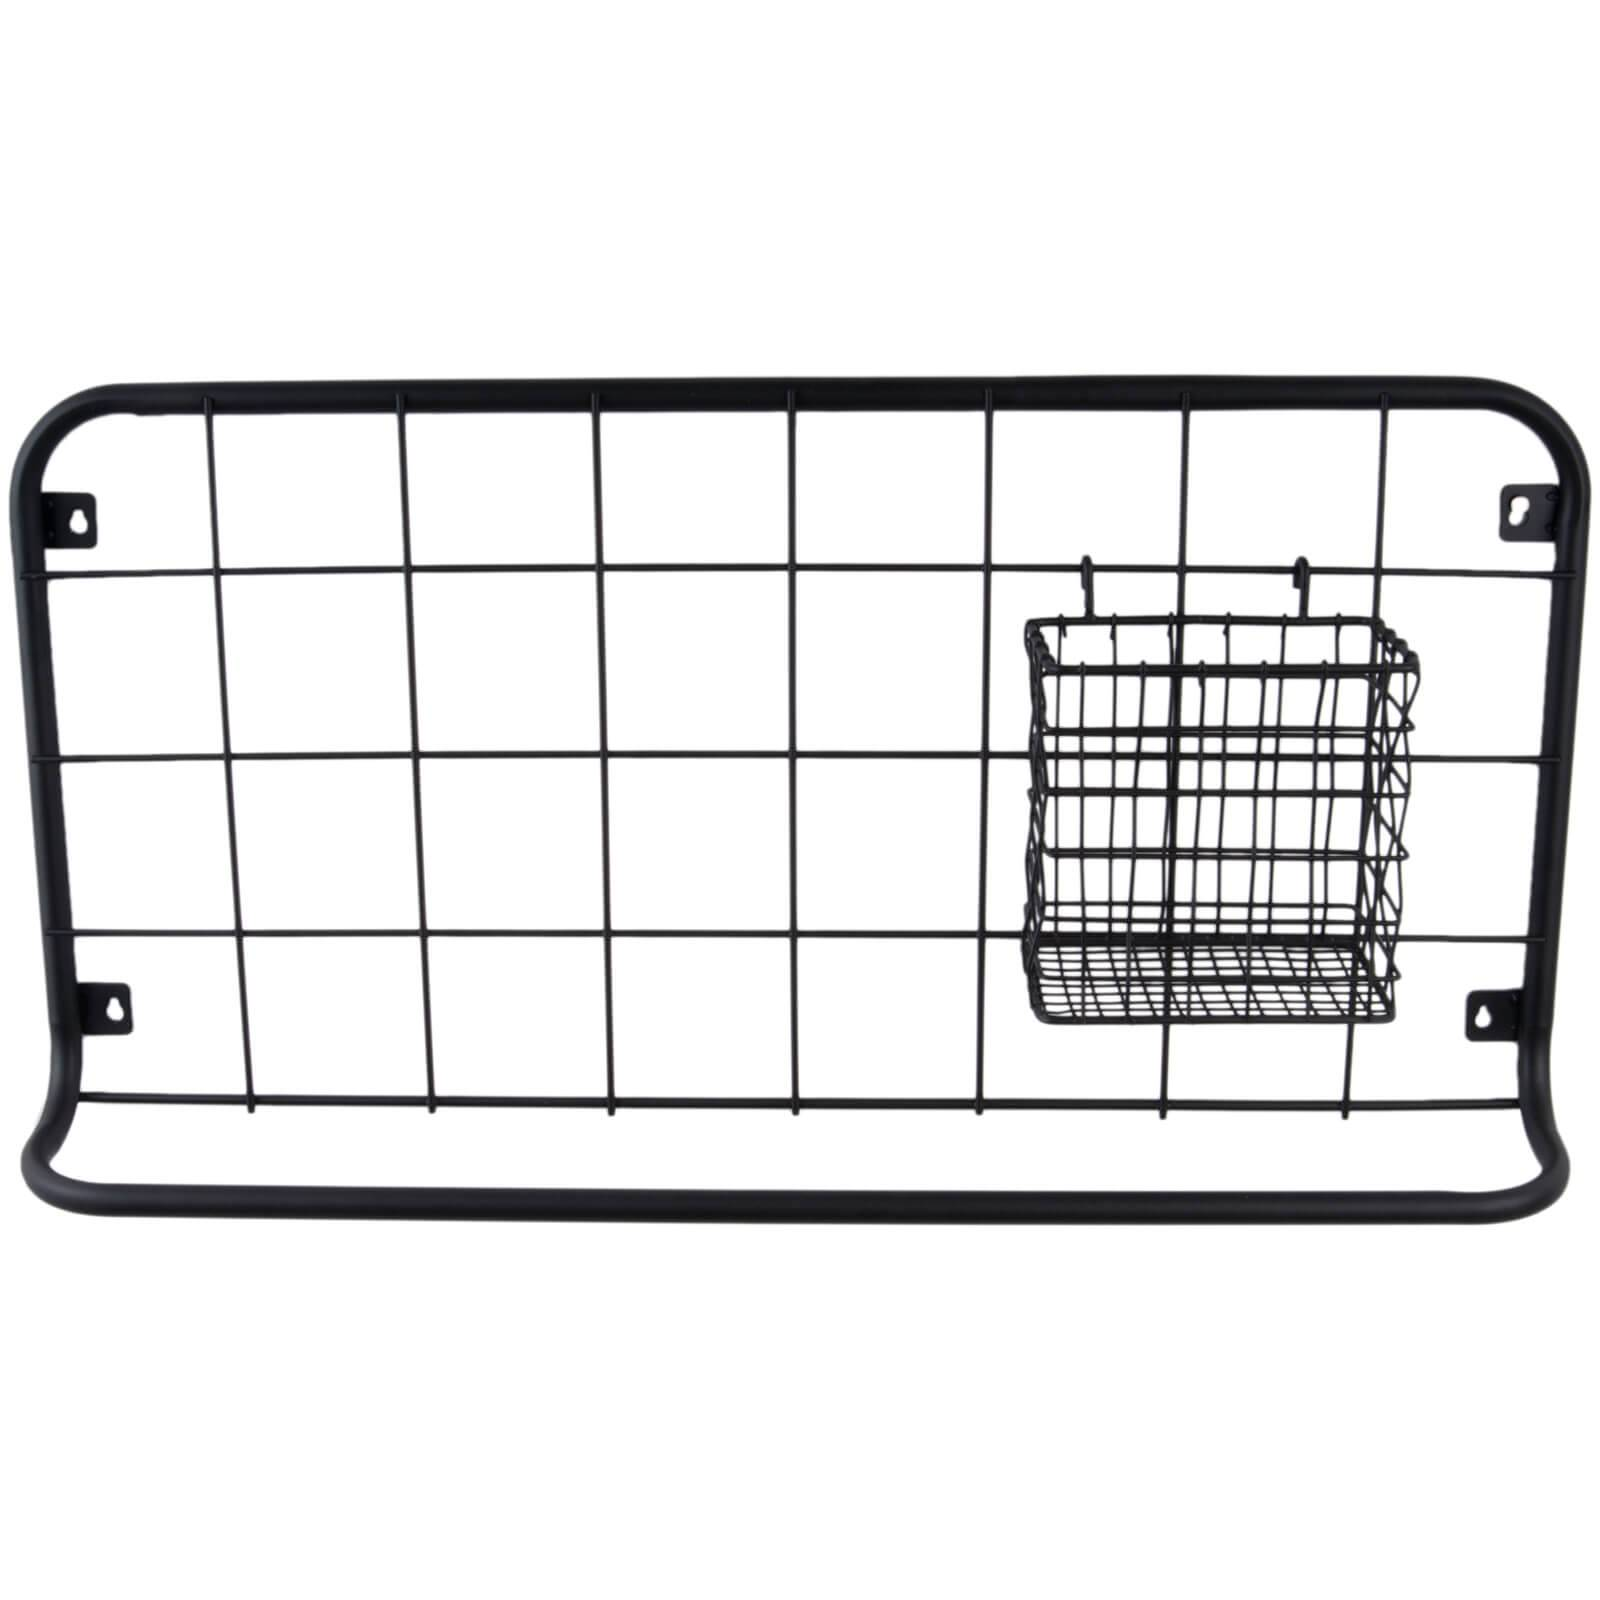 Present Time Open Grid Kitchen Rack Set - Matt Black